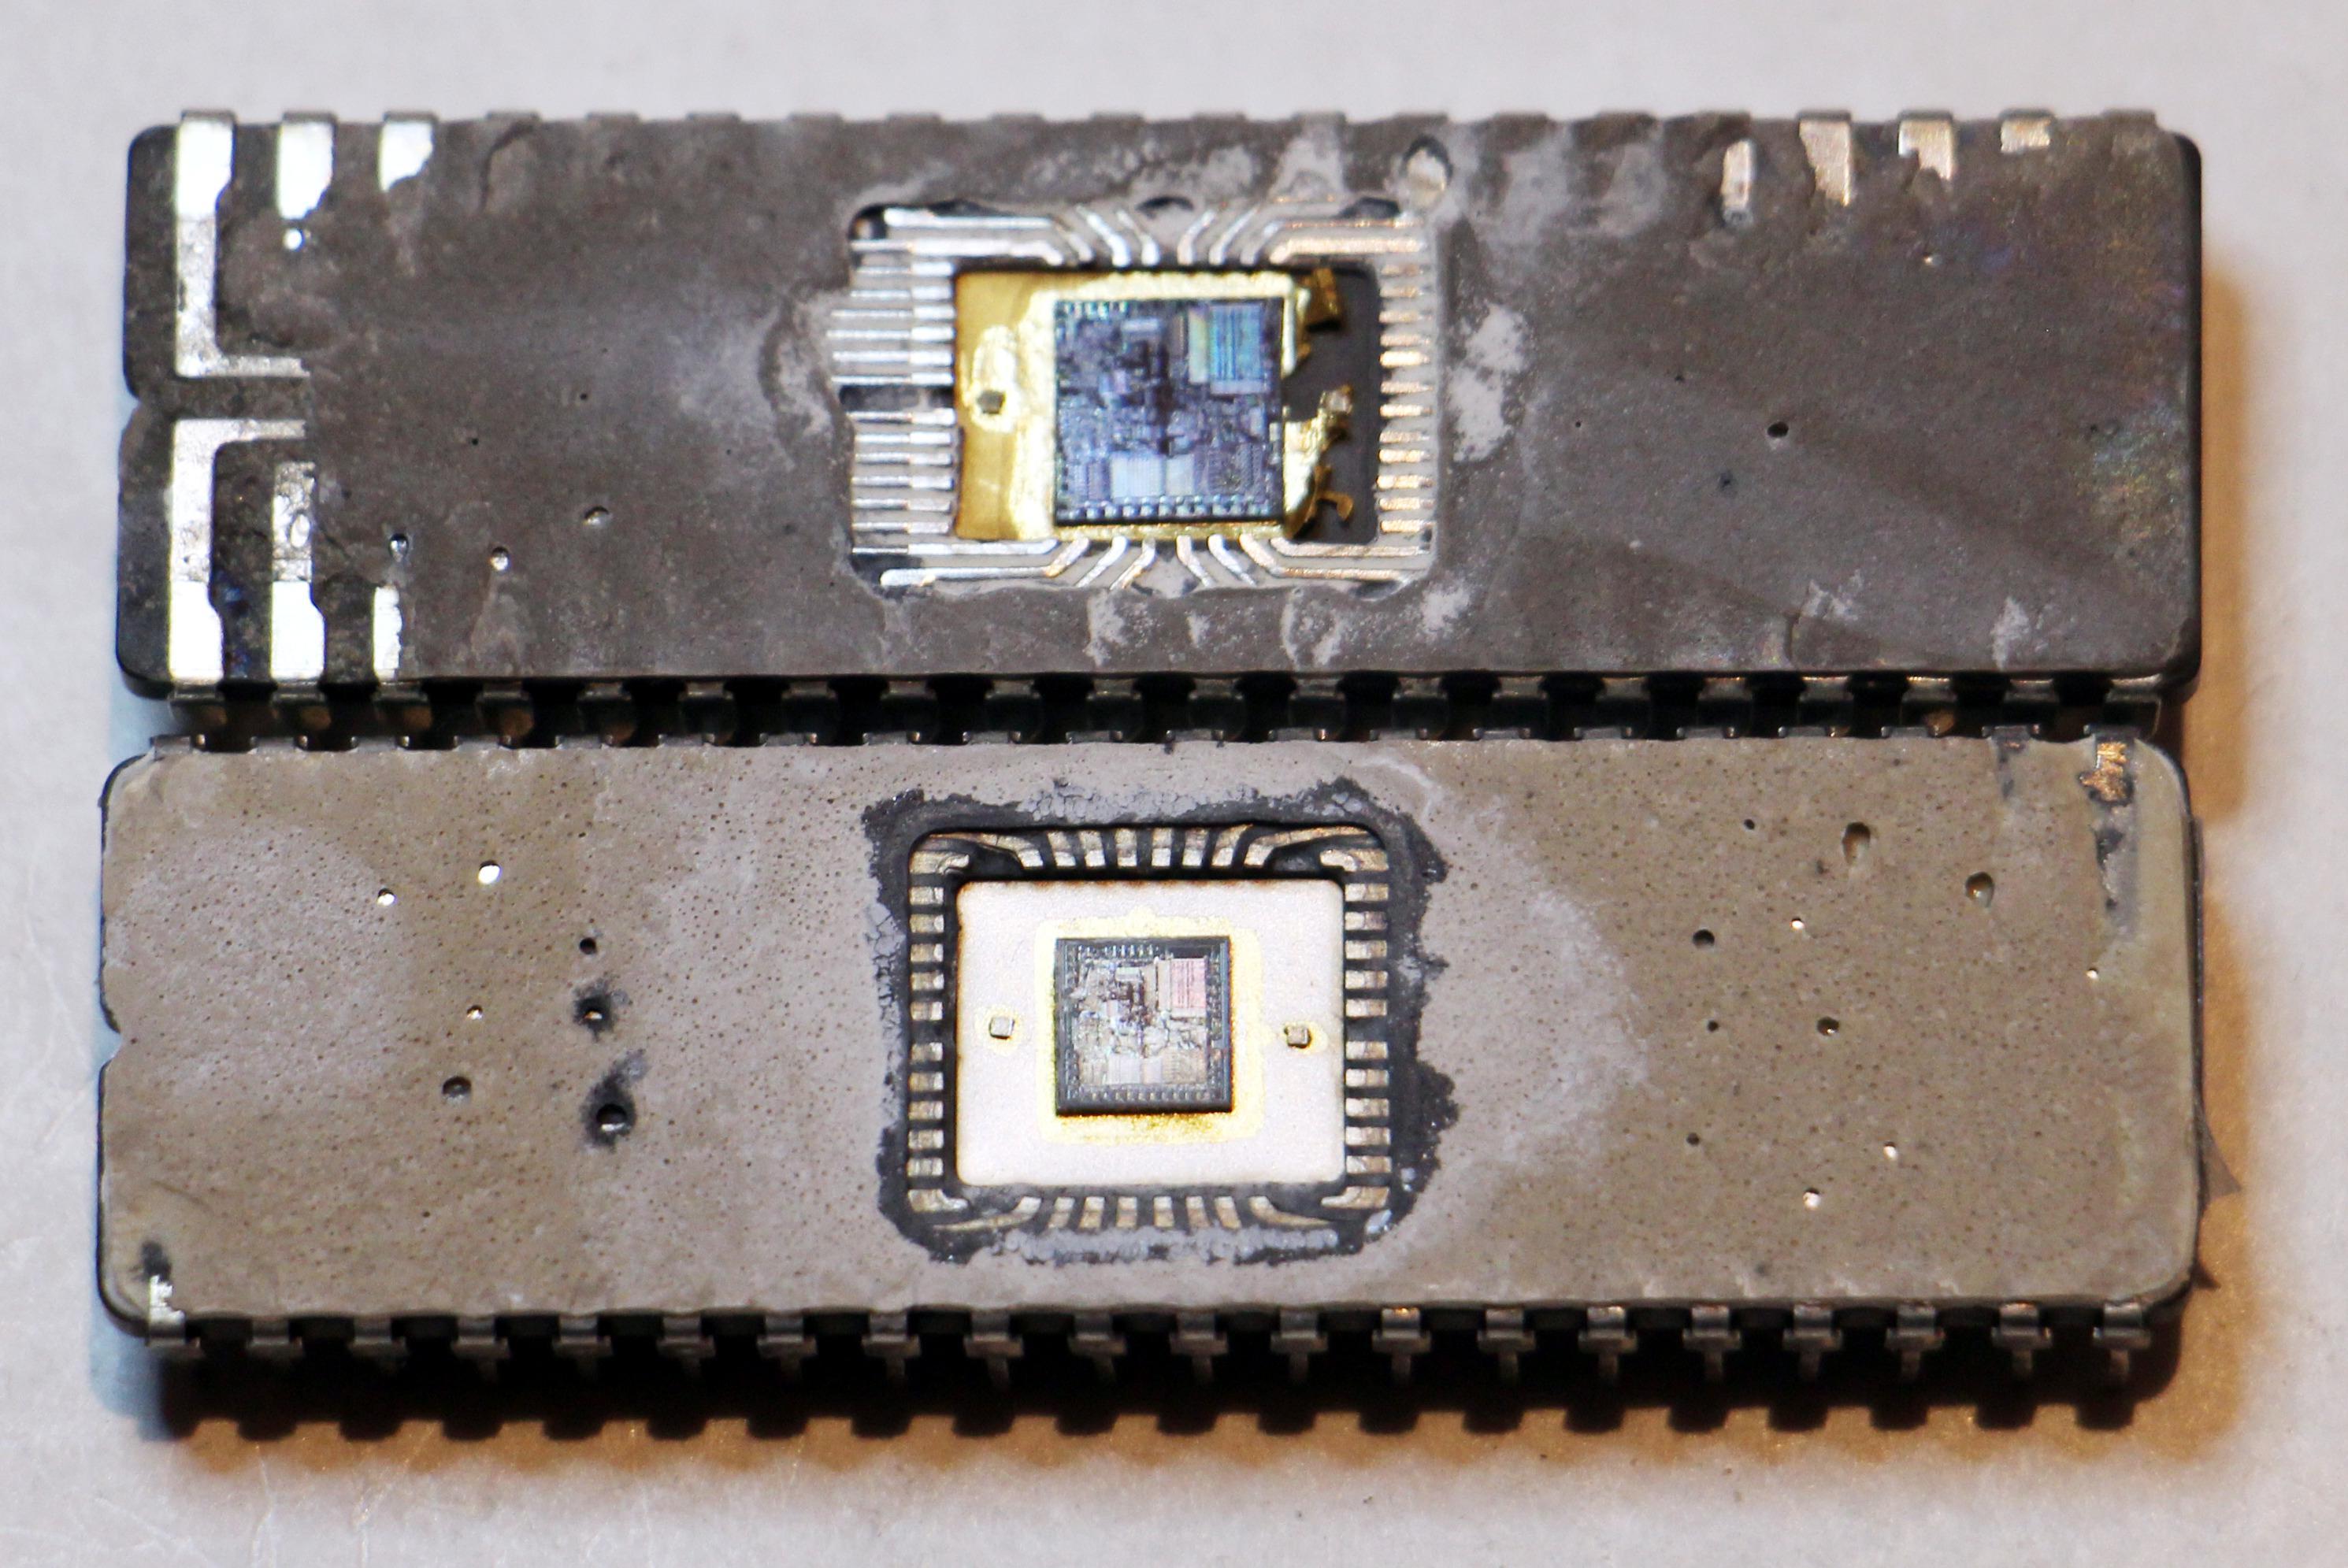 Перевод Масштабирование кристалла как Intel уменьшала масштаб процессора 8086